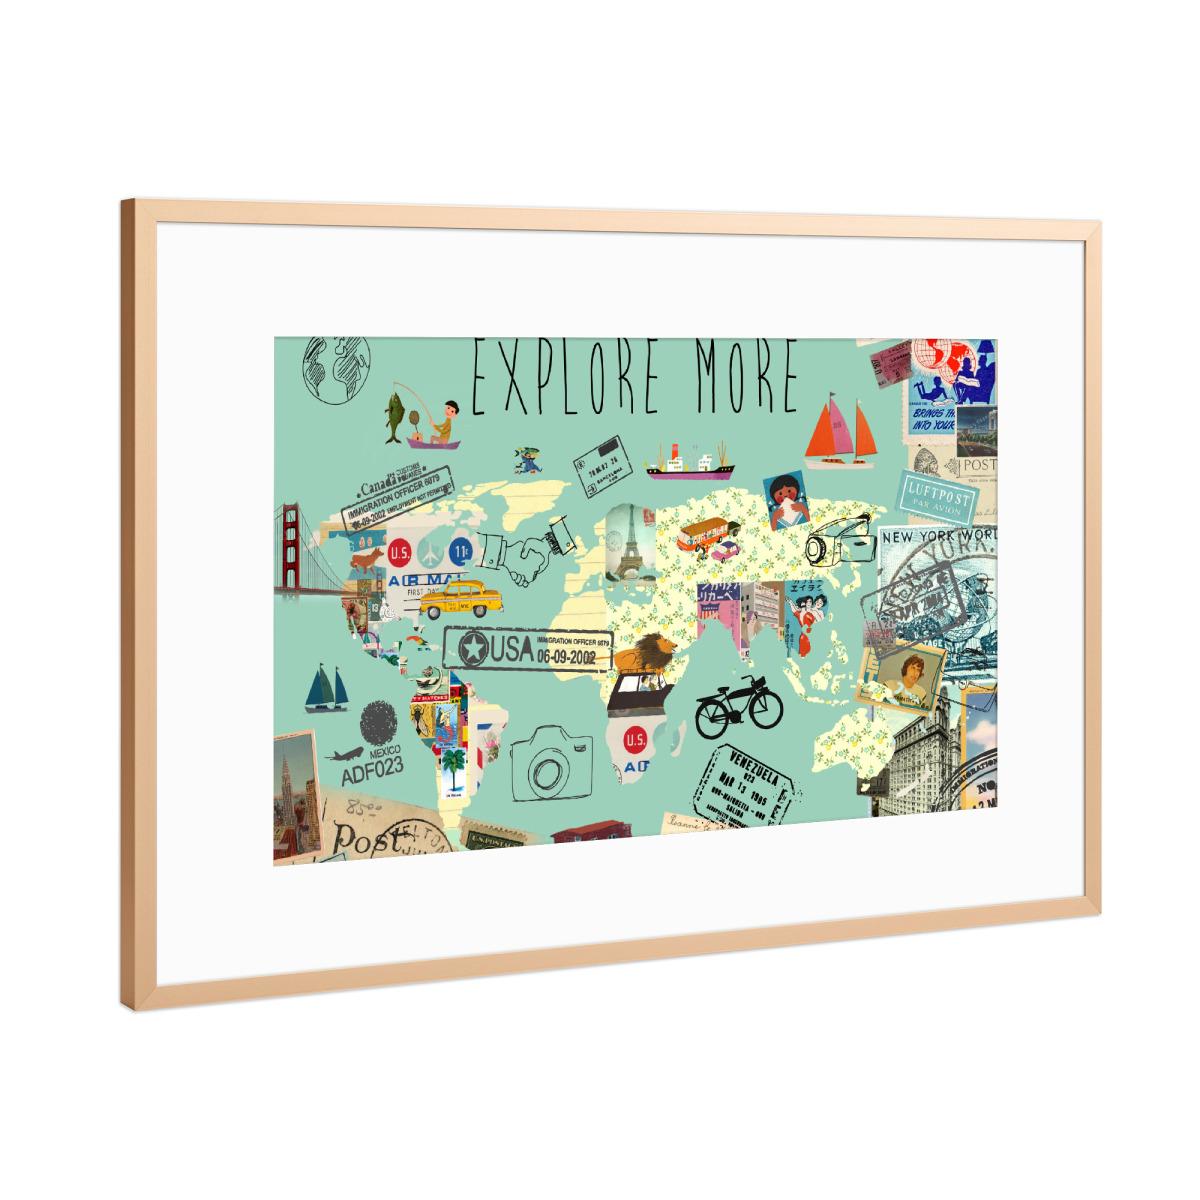 Weltkarte Explore More Als Gerahmt Bei Artboxone Kaufen